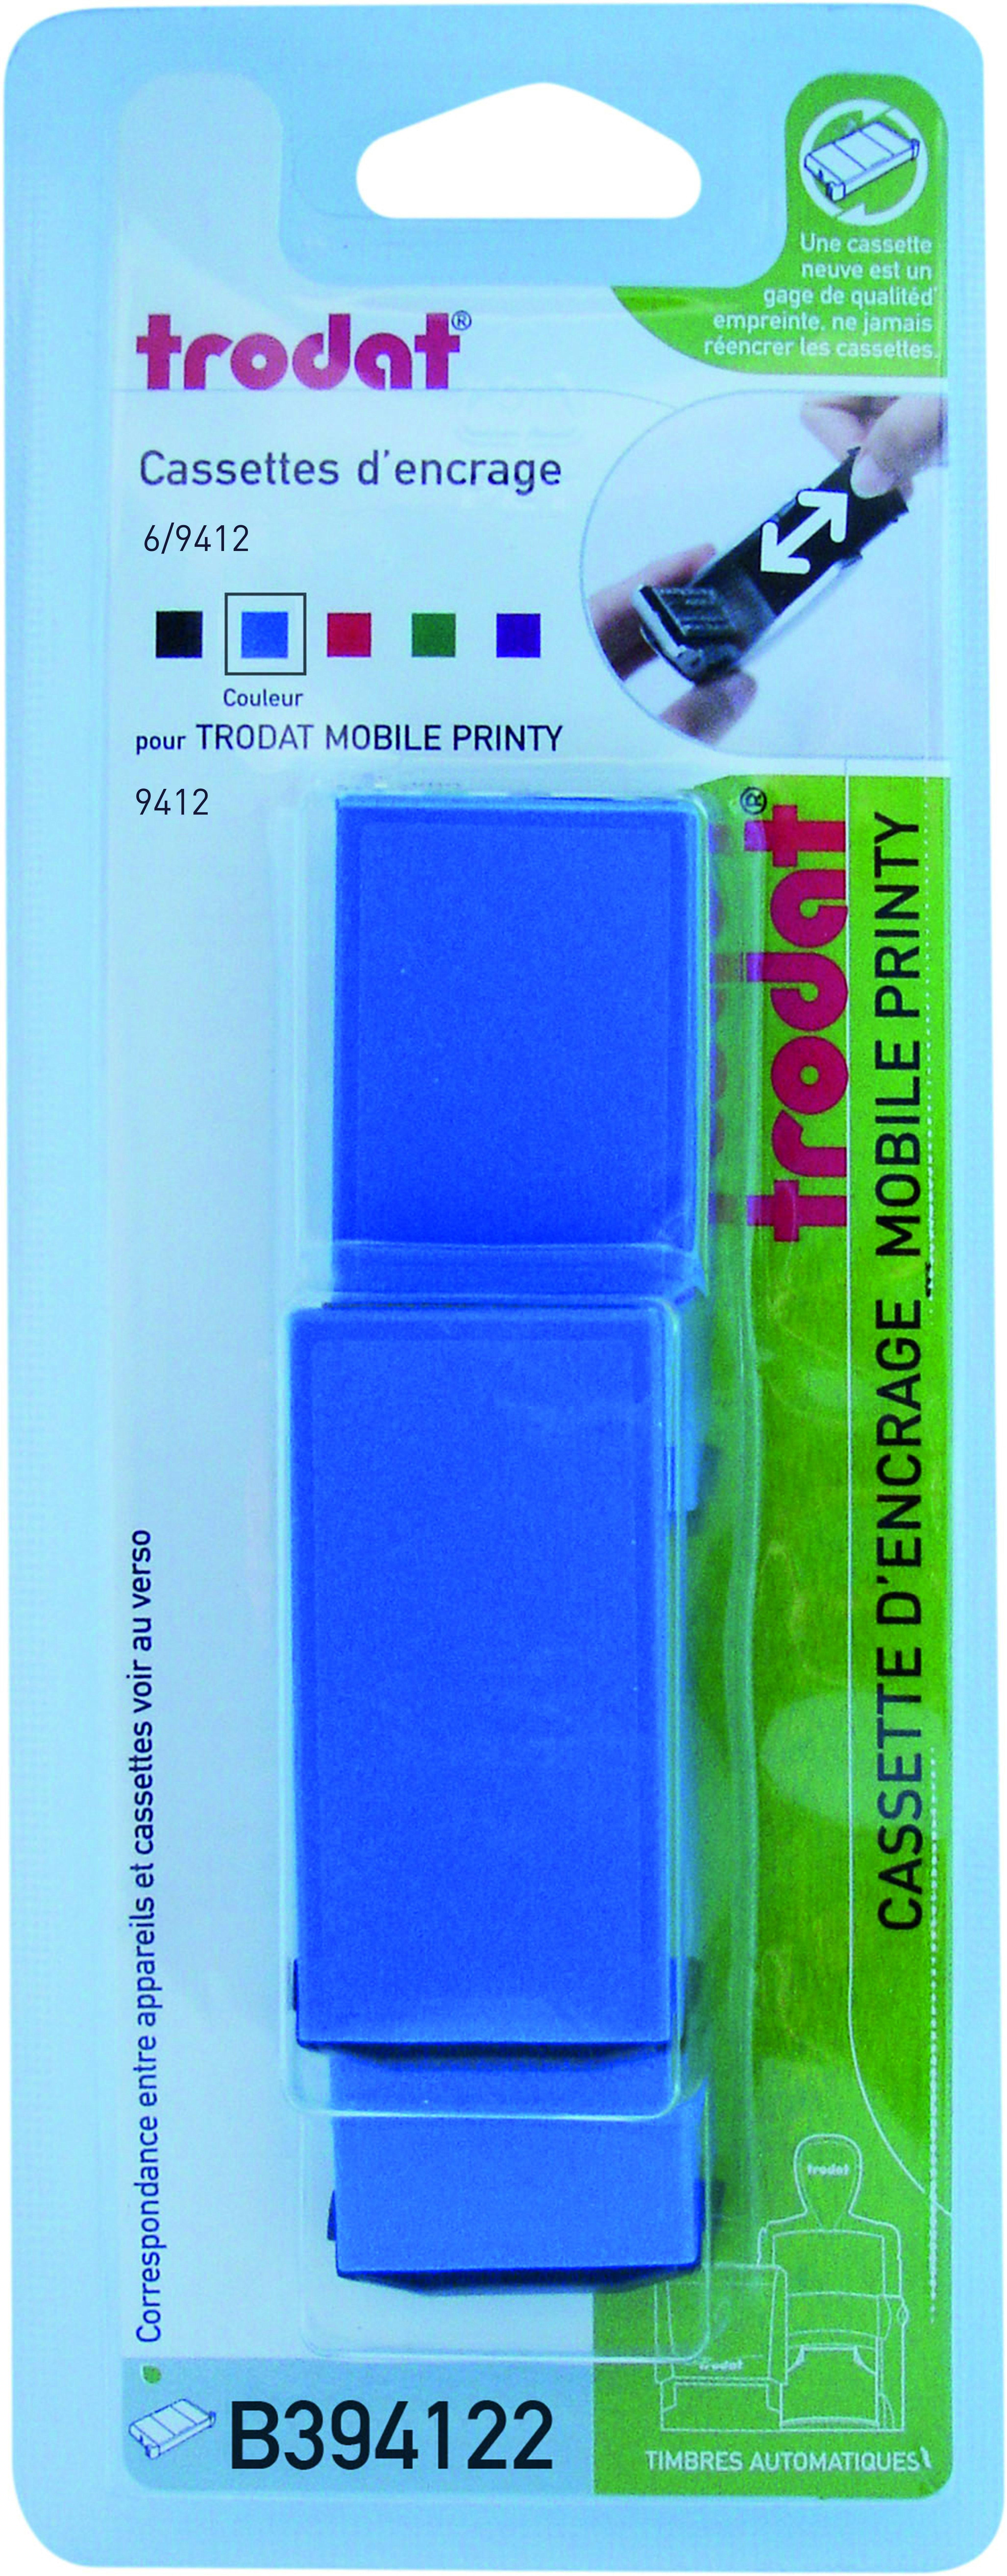 Trodat - 3 Encriers 6/9412 recharges pour tampon Mobile Printy 9412 - bleu